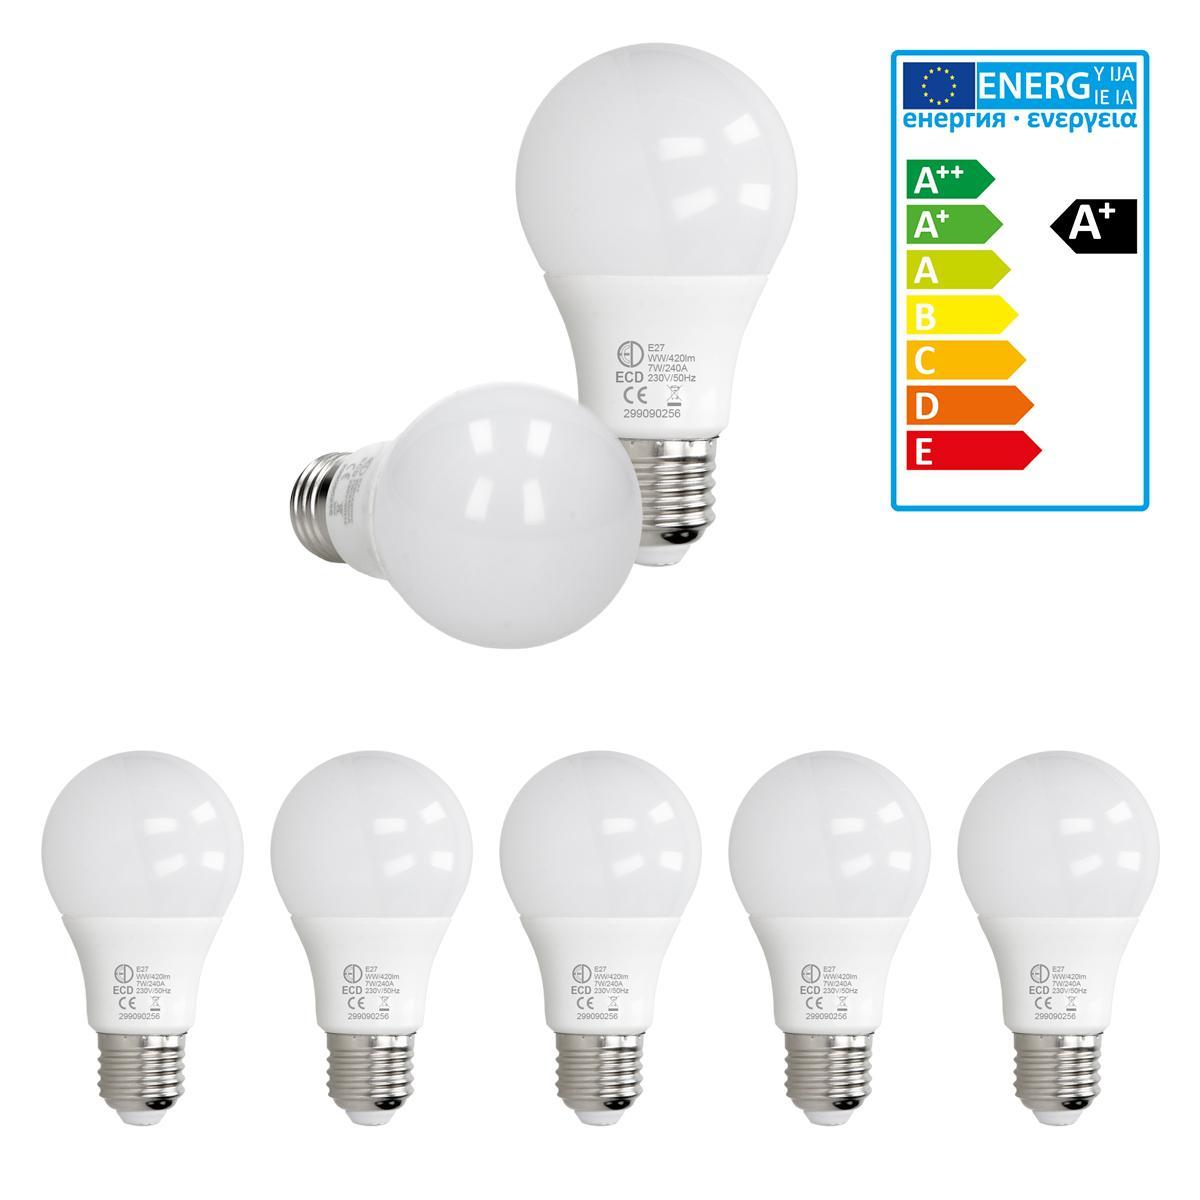 Ecd Germany ECD Germany 5 pièces 7W E27 ampoule LED   3000 Kelvin   Angle de faisceau 270 °   420 lumens   Blanc chaud   220-240 v  